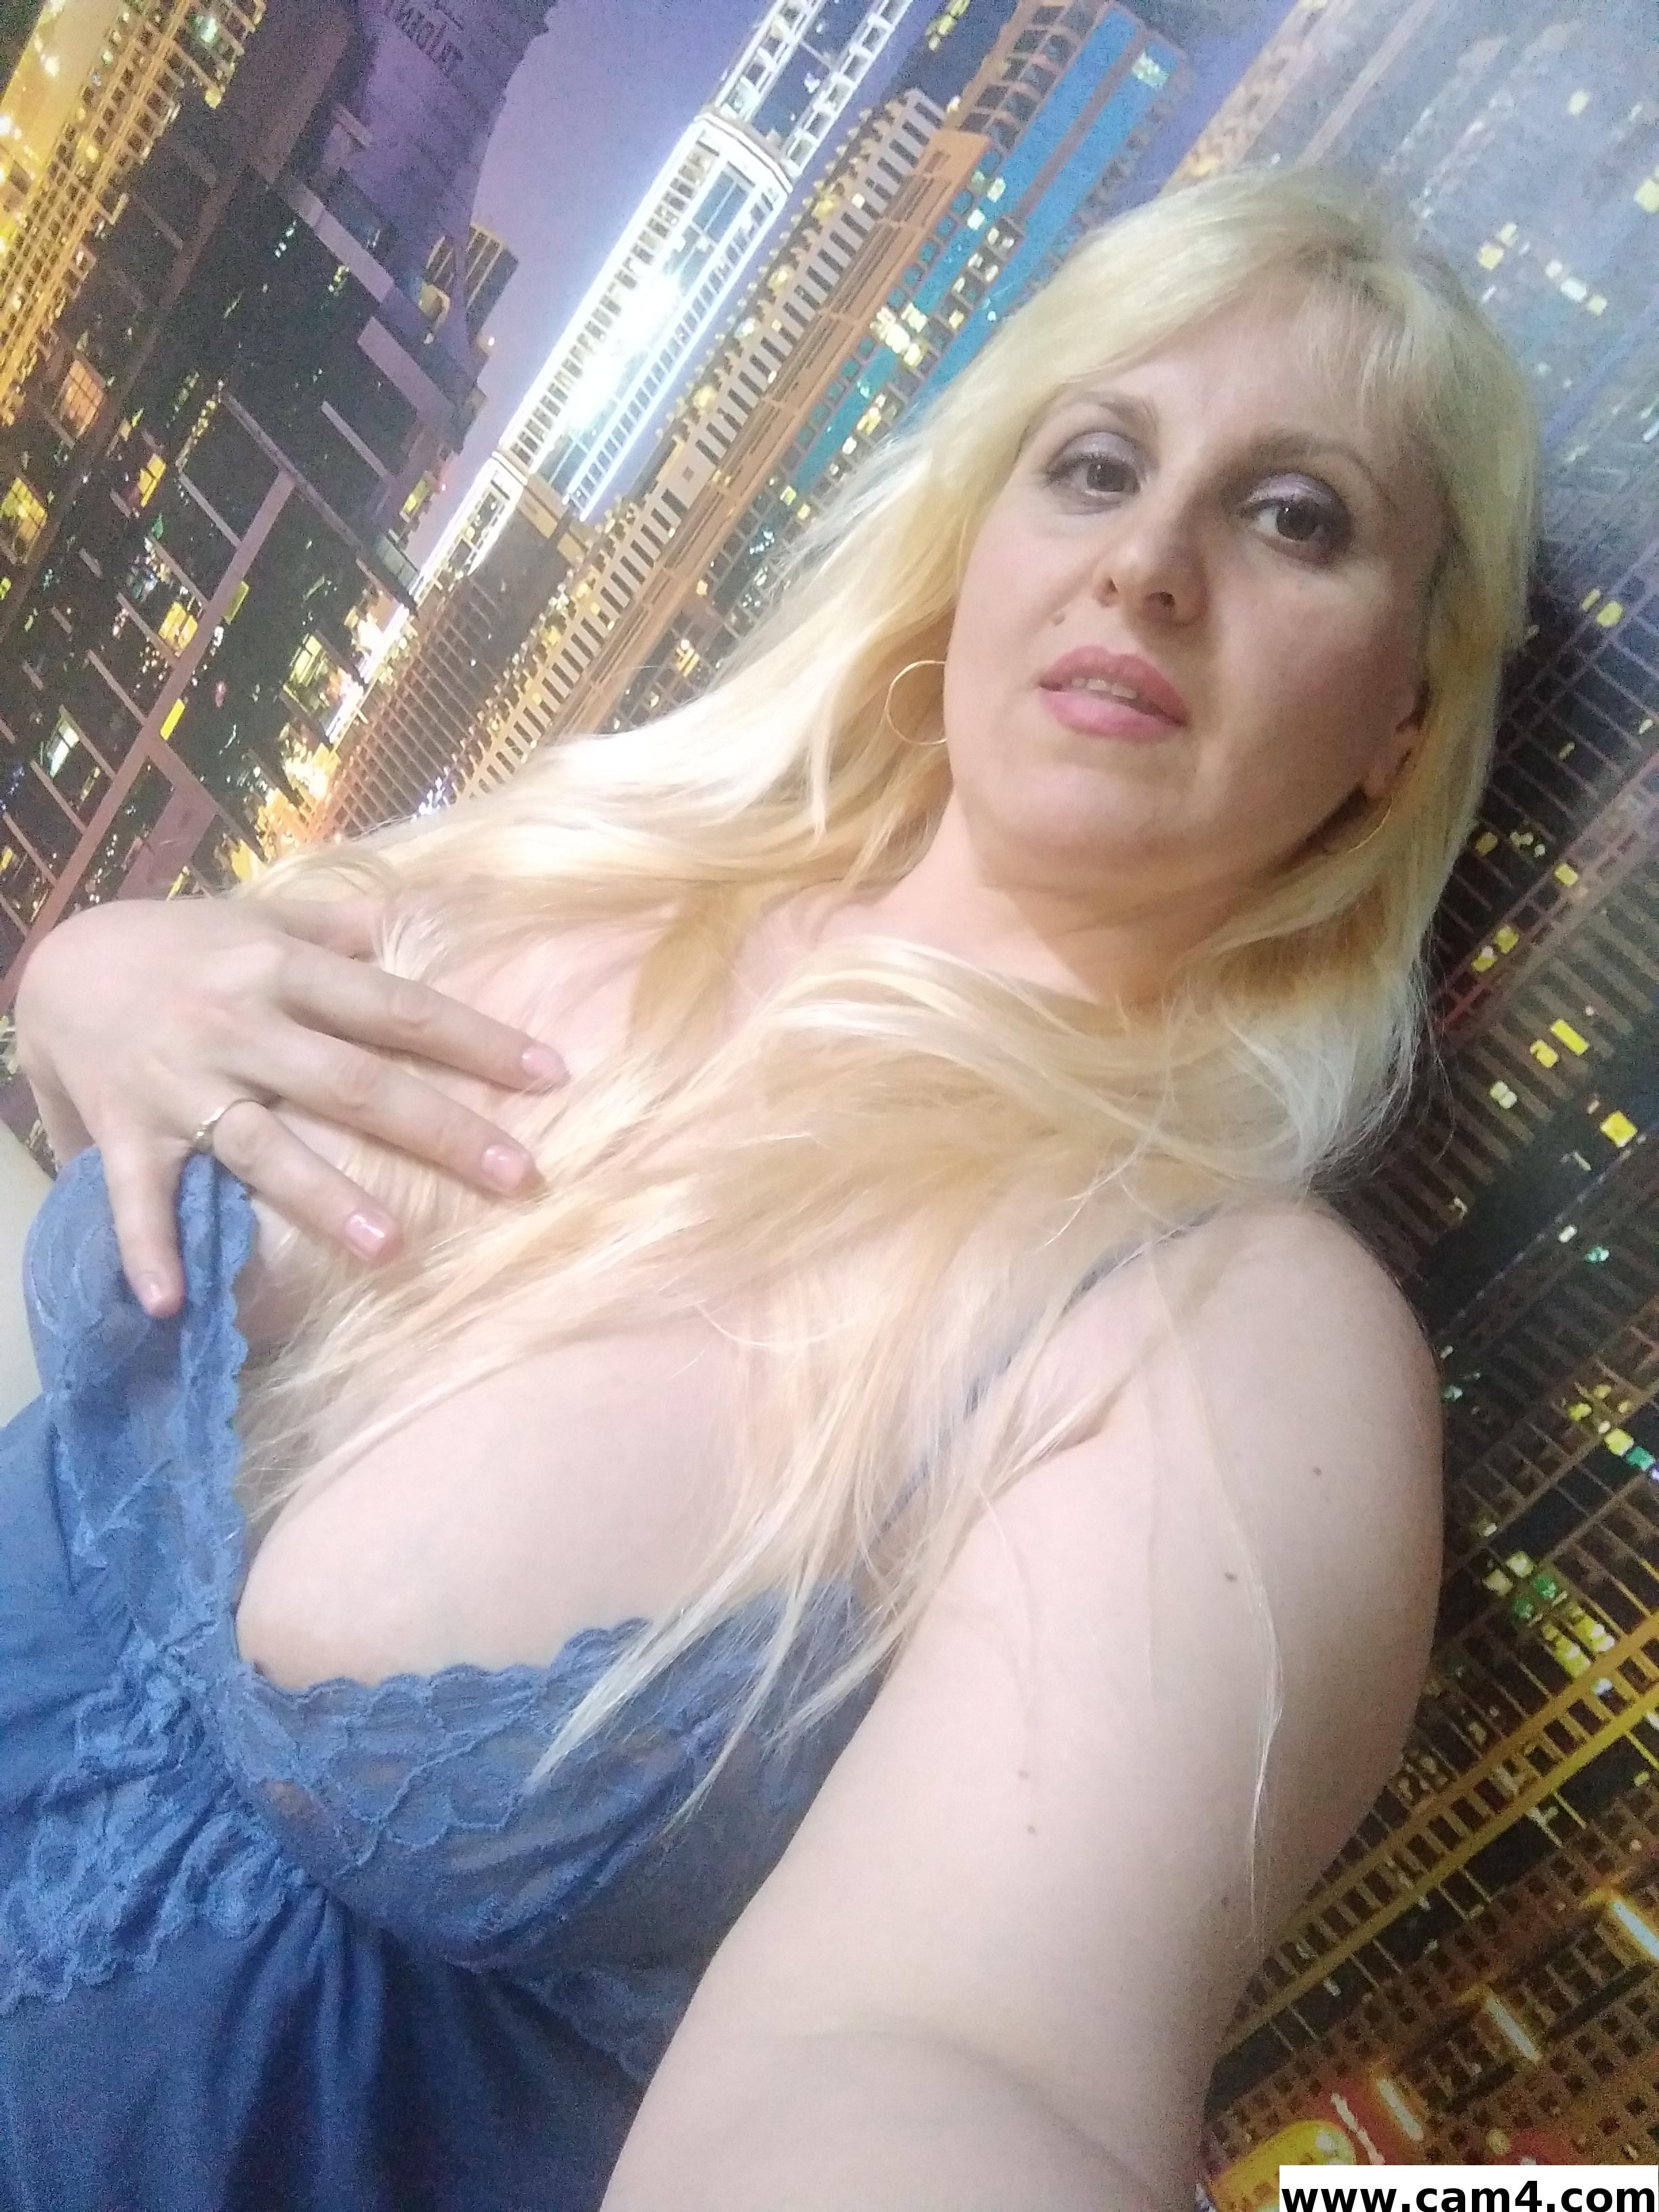 Blondabella?s=ateqpa0iozau56dhfasetldouj9ngzecy8x1kaljjh8=